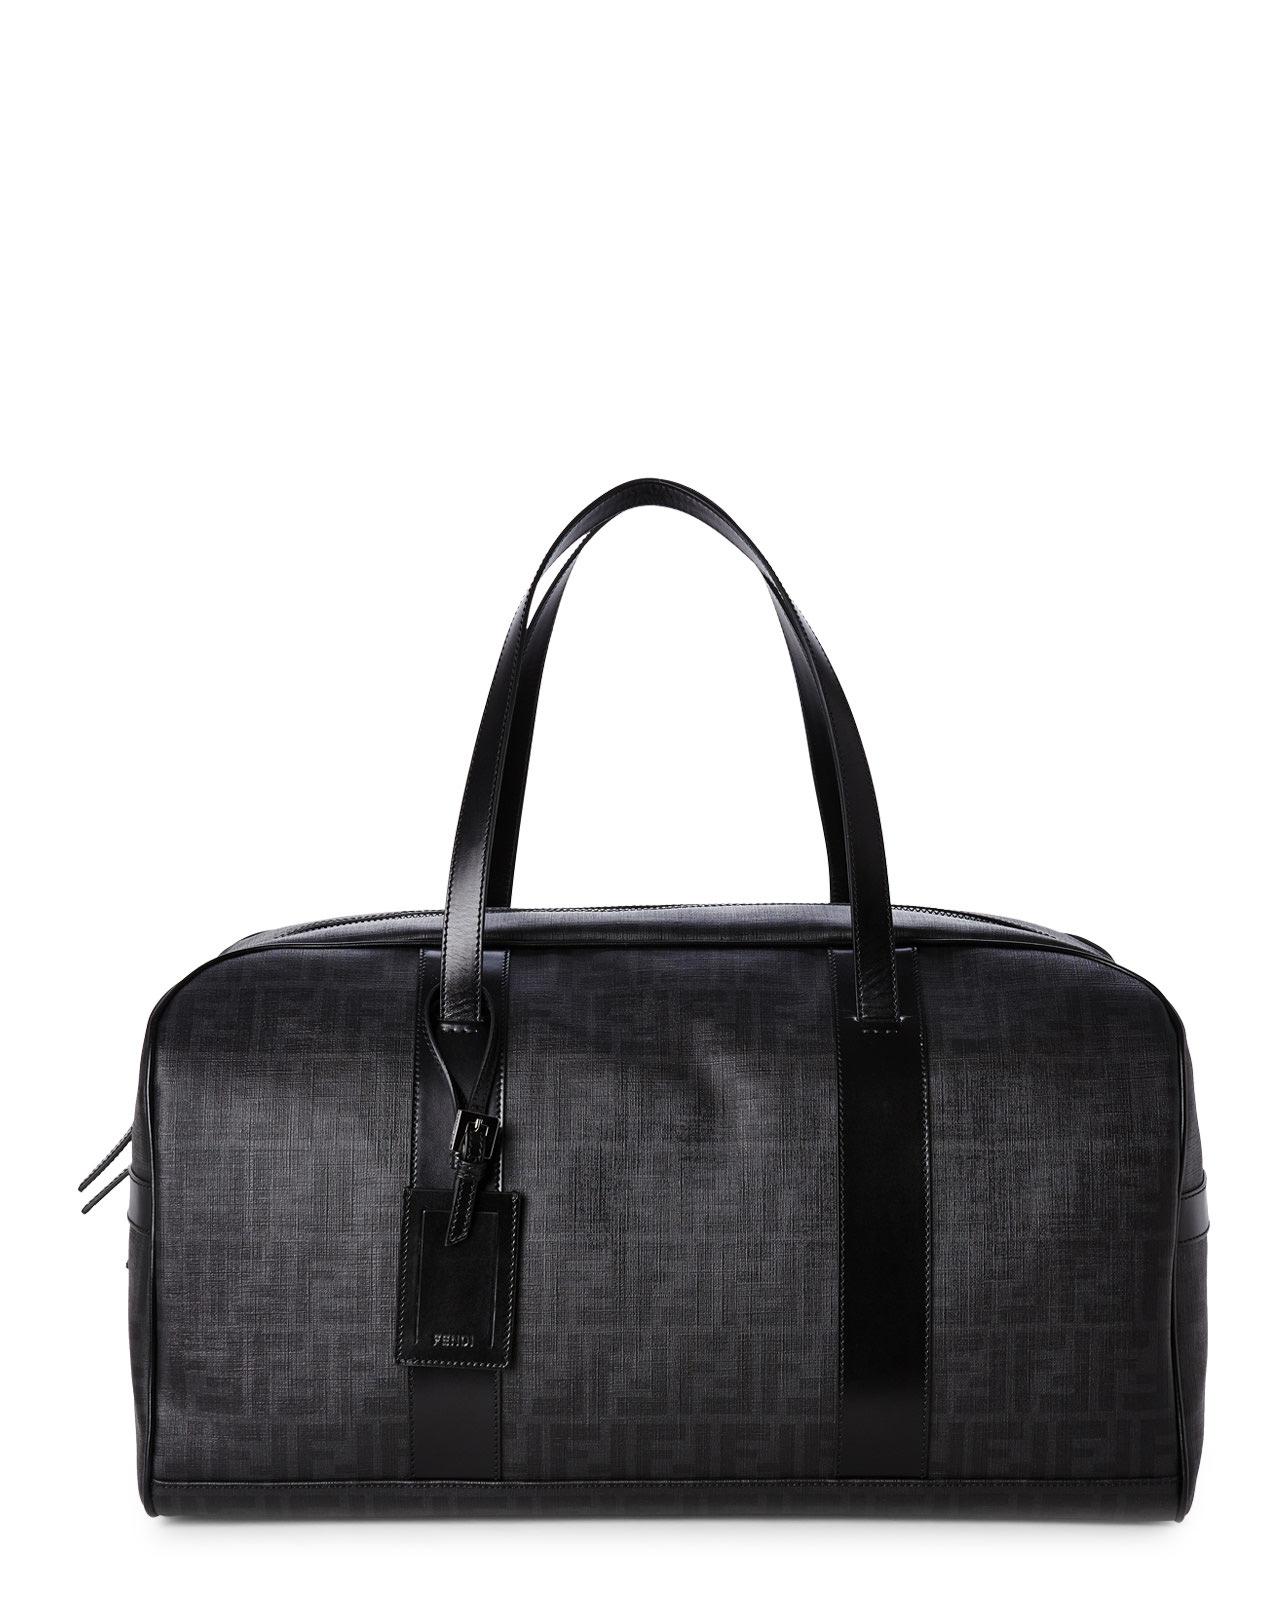 c82c3ec1203e ... italy lyst fendi black zucca weekender bag in black for men 33d18 343b5